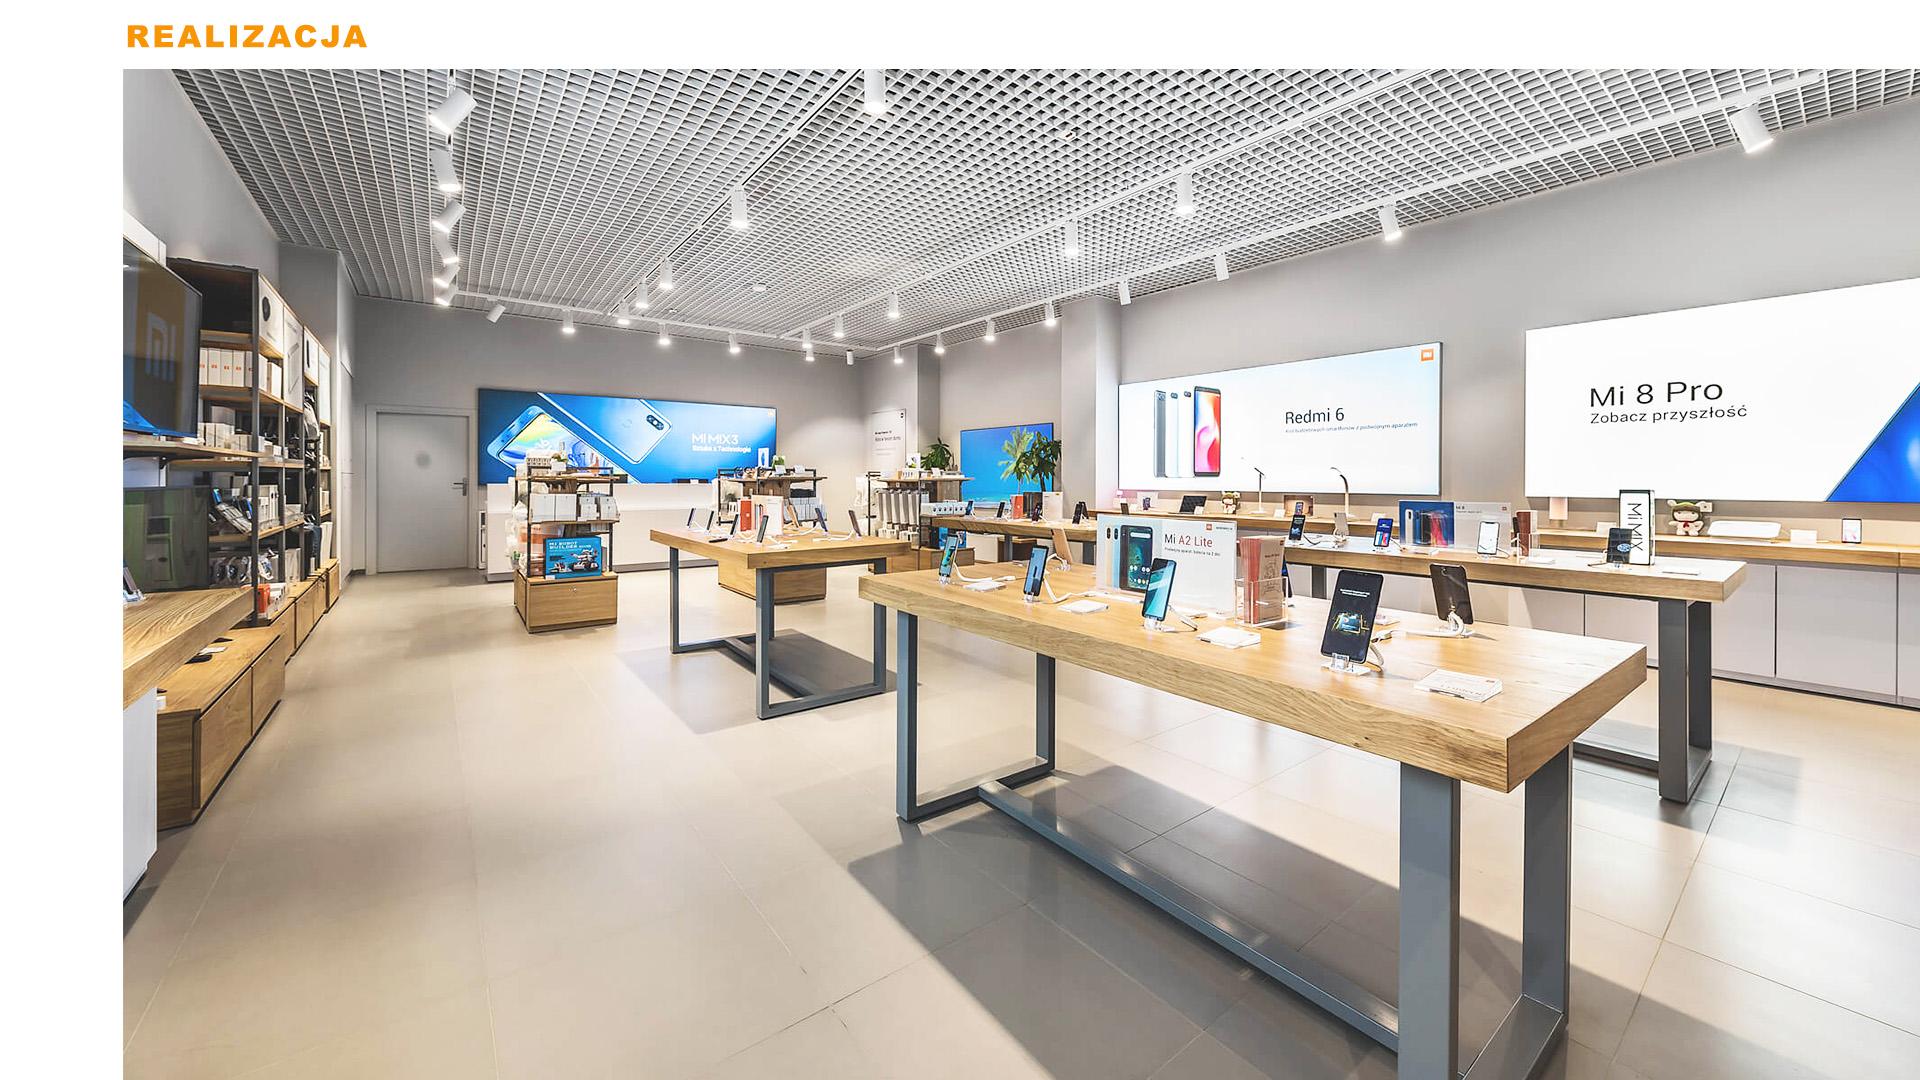 Mi-Store - Gdynia - Centrum Riviera - realizacja